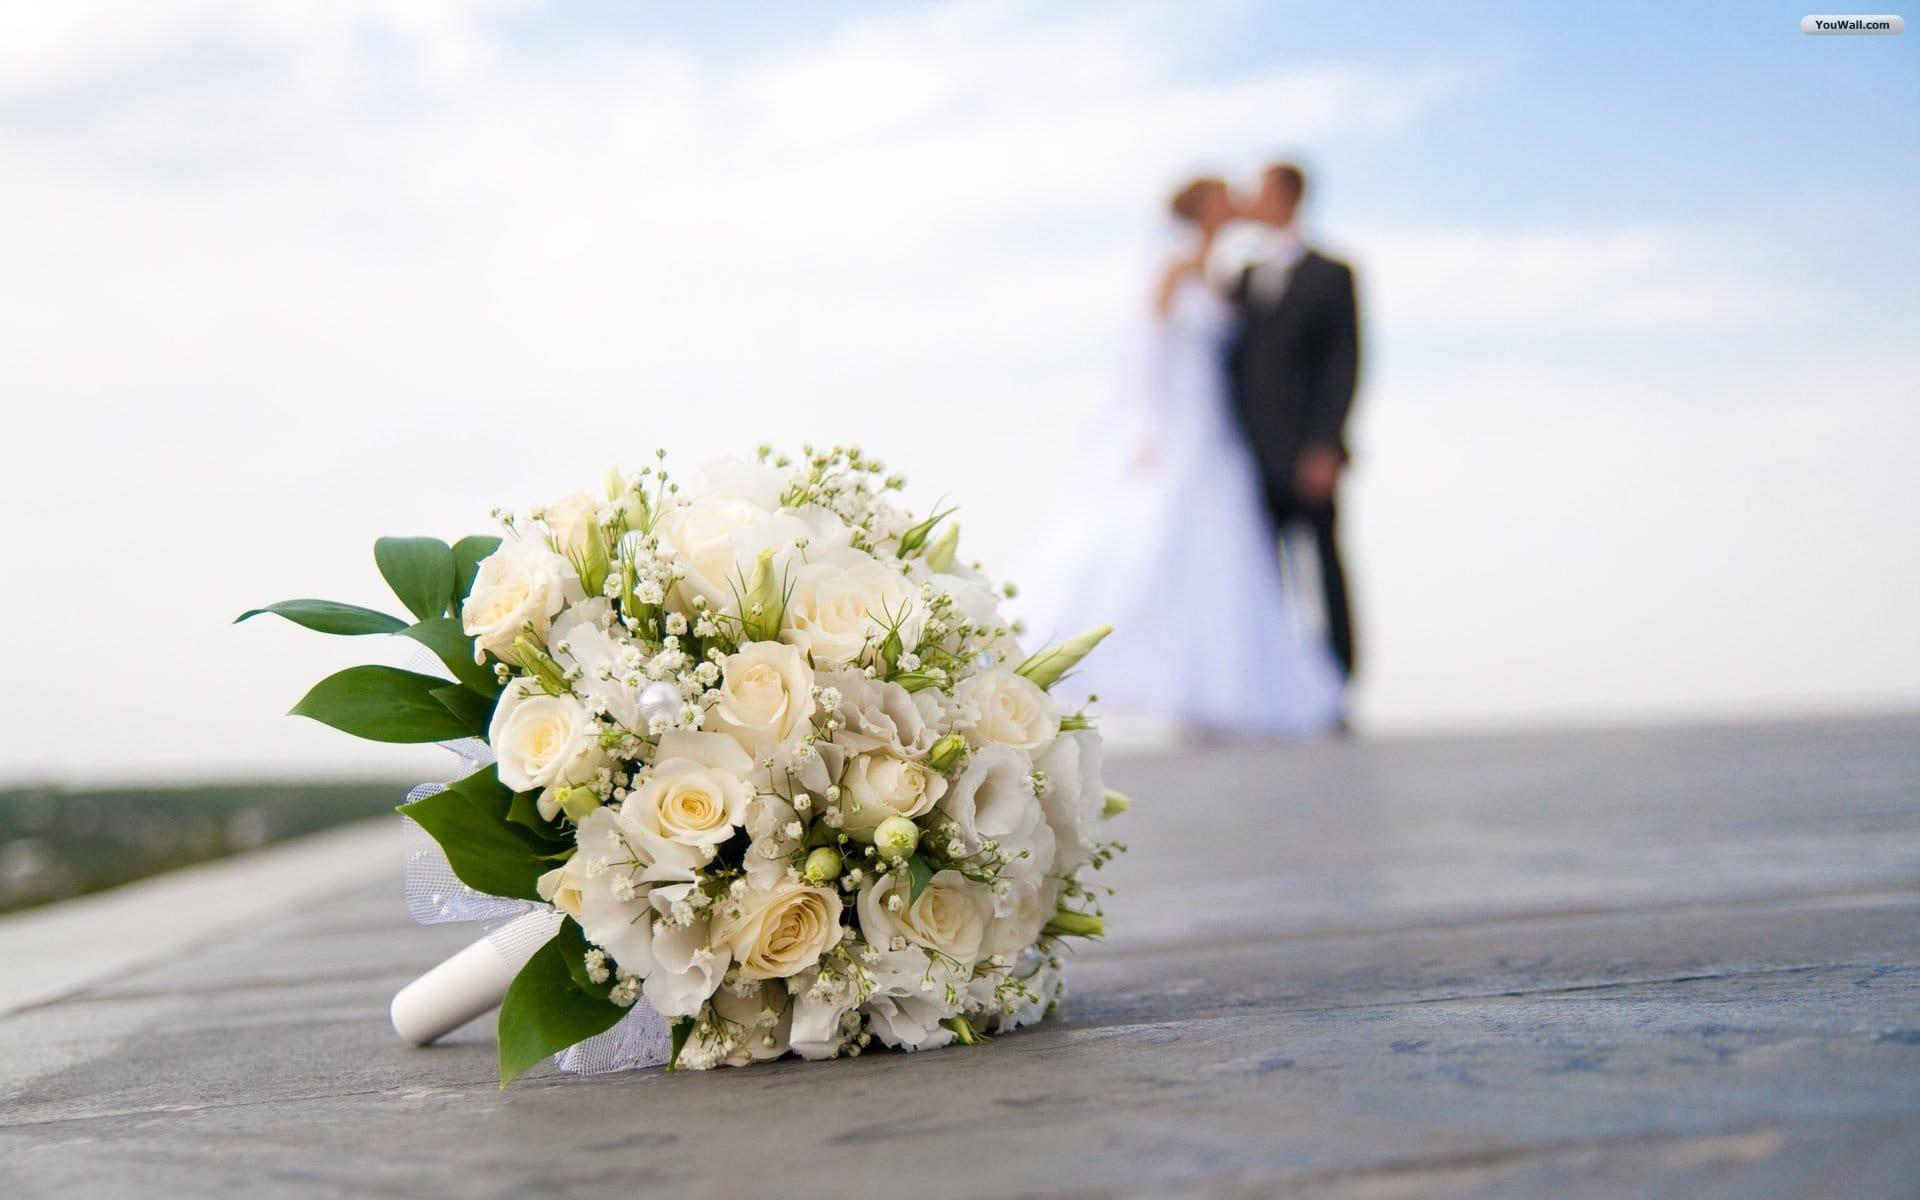 Wedding Limousine Hire, Wedding Limo Hire Oakville, Wedding Limo Hire Toronto, Wedding Limo Service